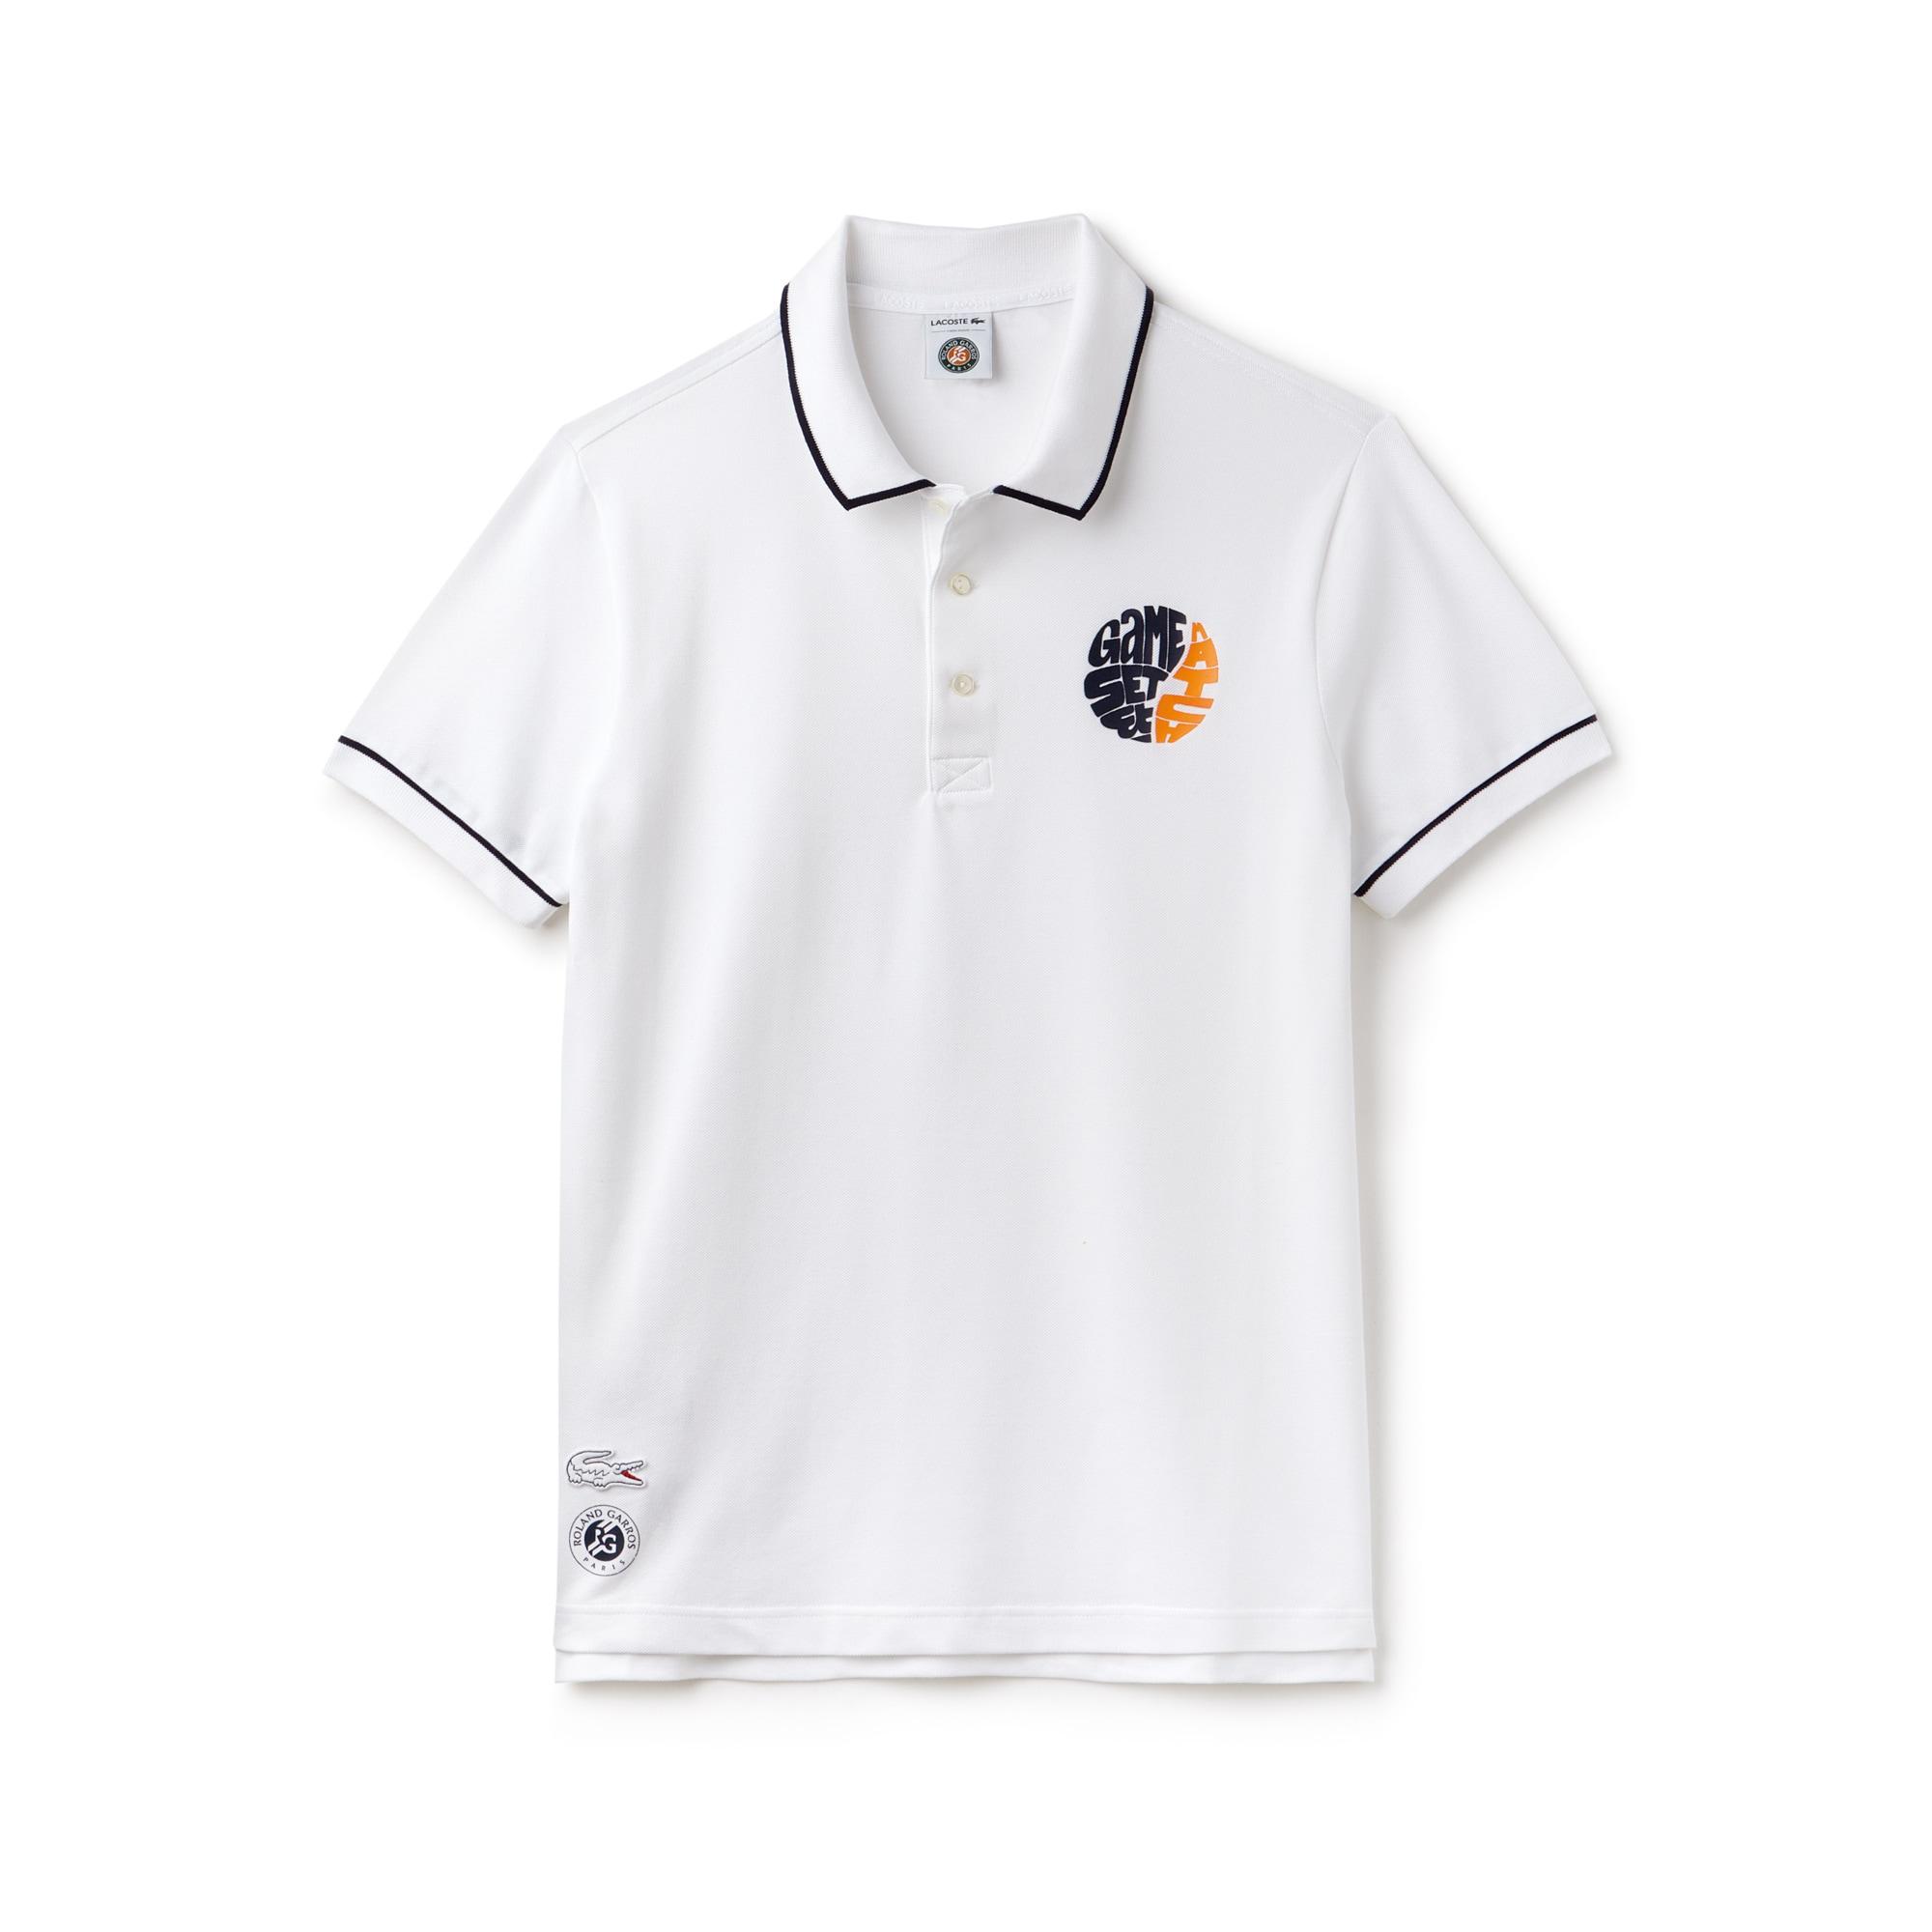 Men's Lacoste SPORT Roland Garros Edition Stretch Mini Piqué Polo Shirt